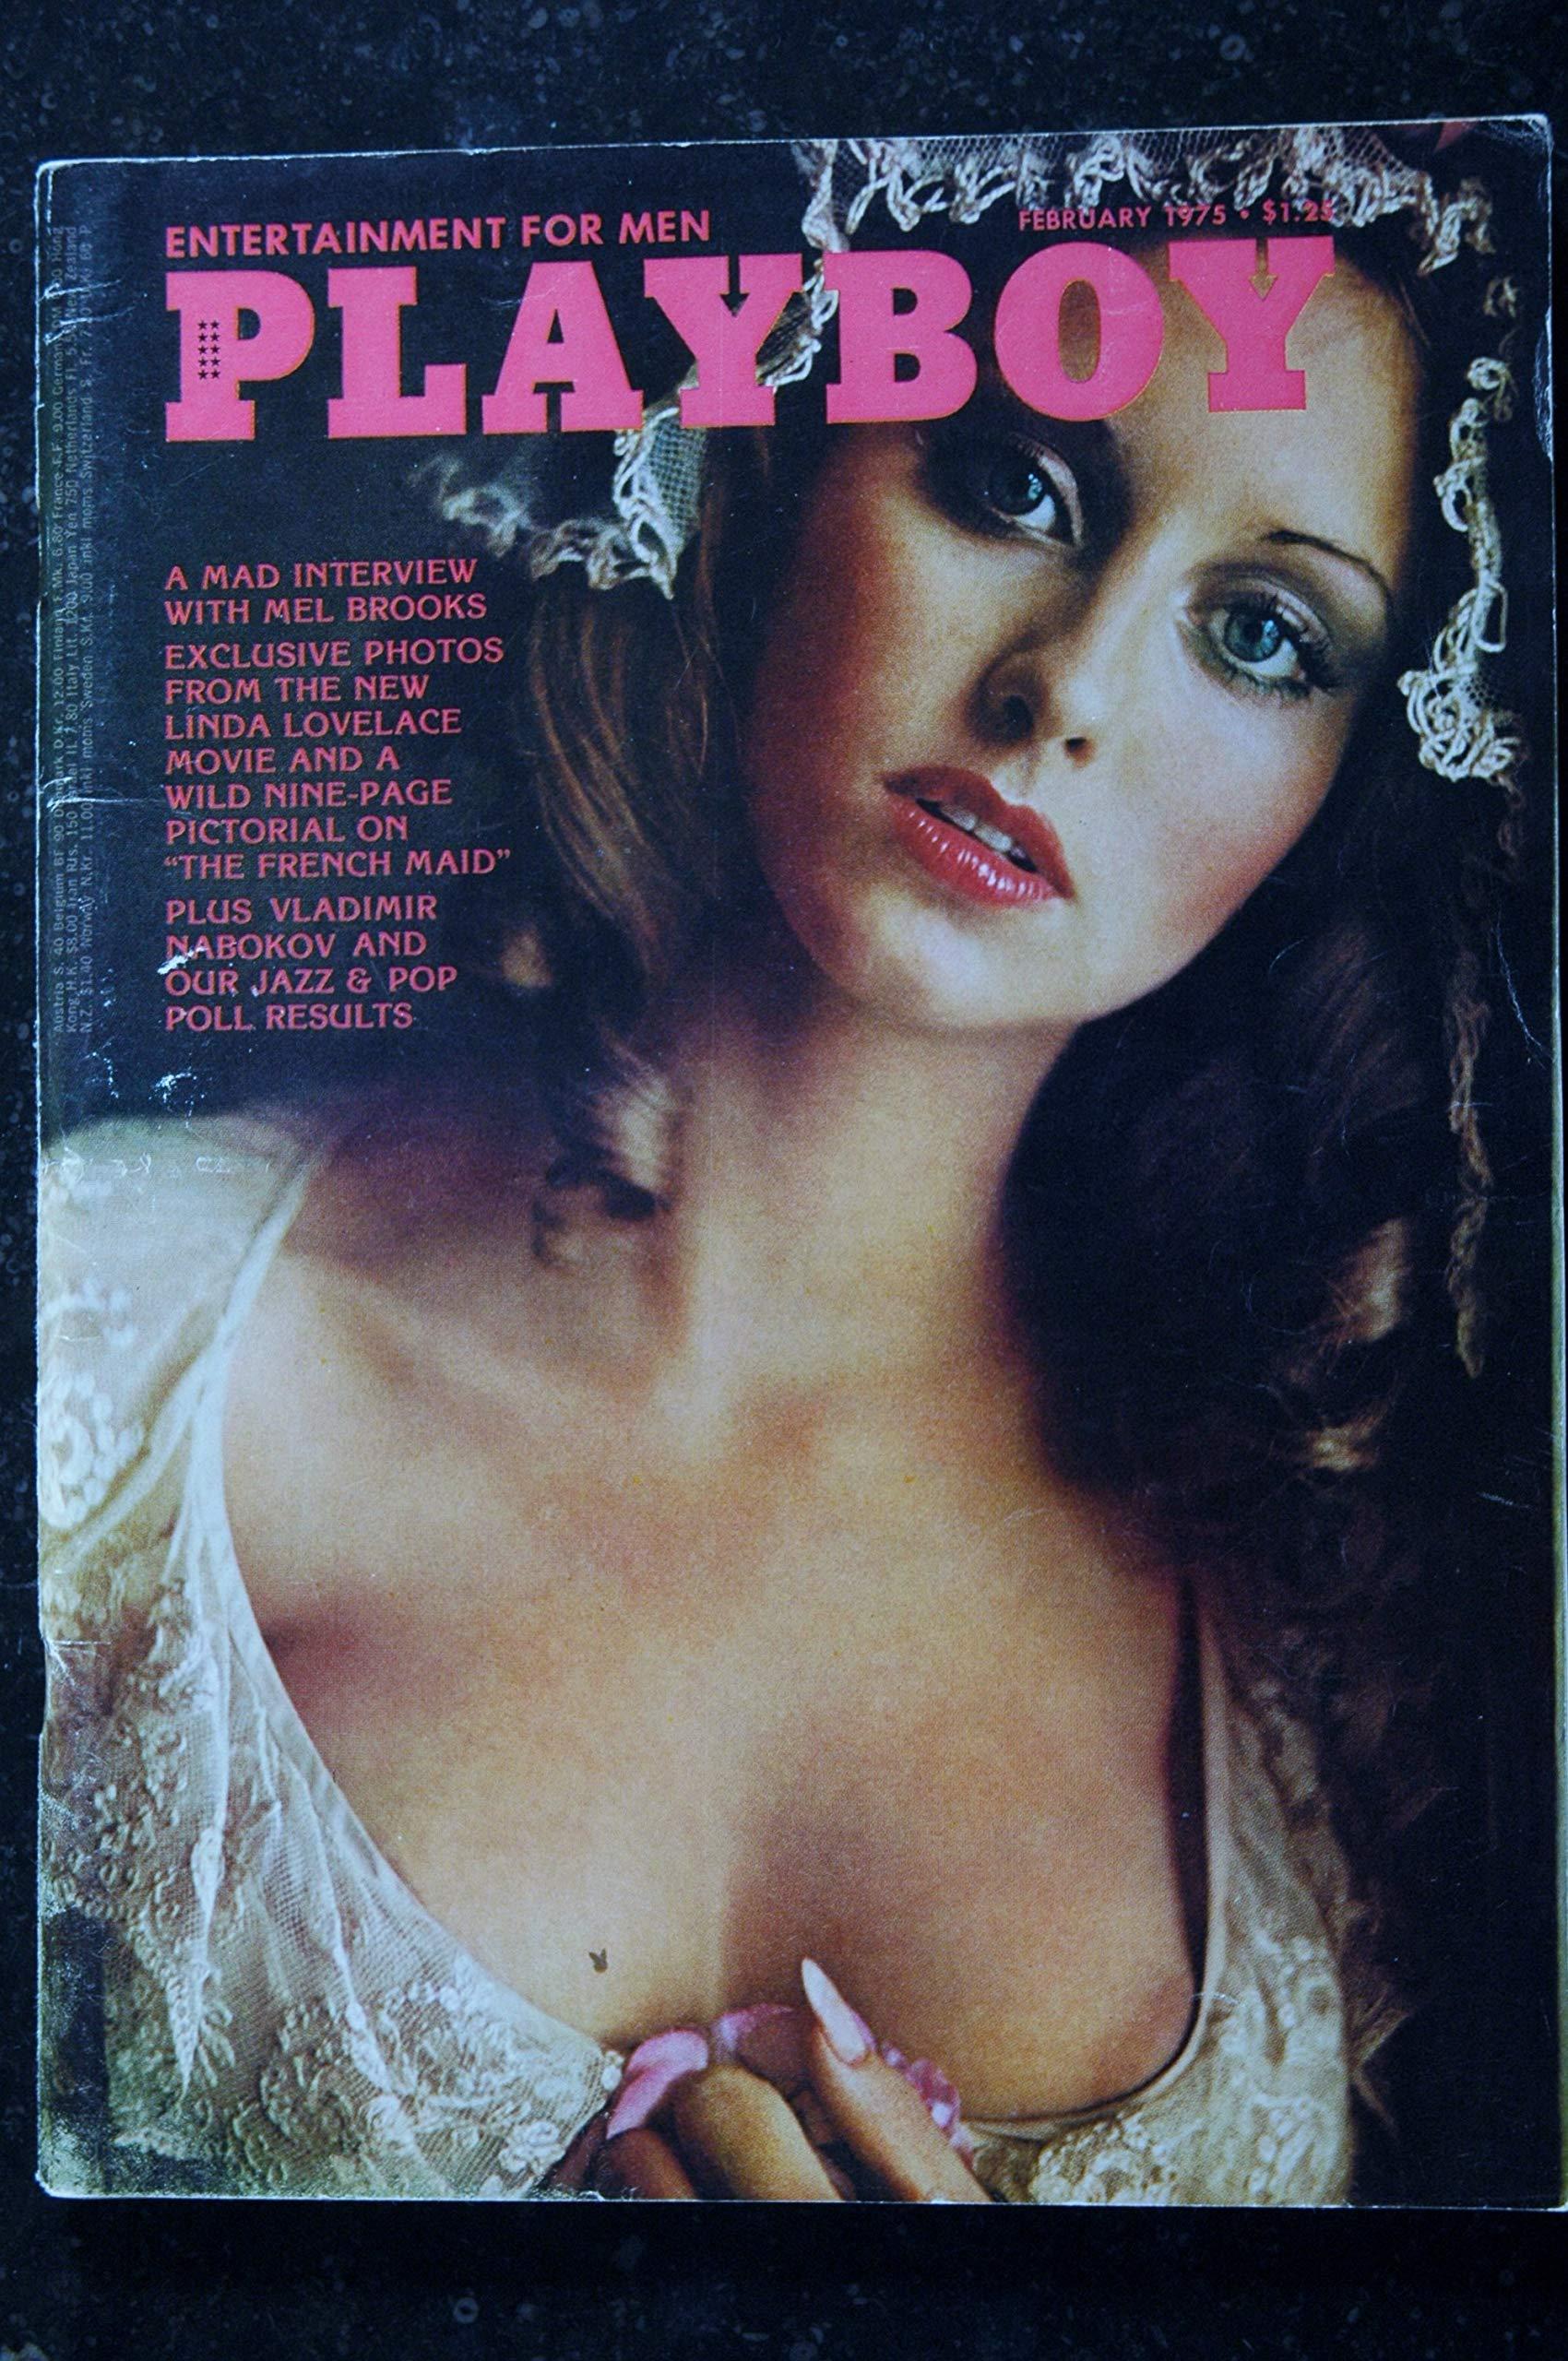 PLAYBOY Us 1975 02 NABOKOV MEL BROOKS PHOTO LINDA LOVELACE INTEGRAL NUDES  HOT LAURA MISCH Single Issue Magazine – January 31, 1975